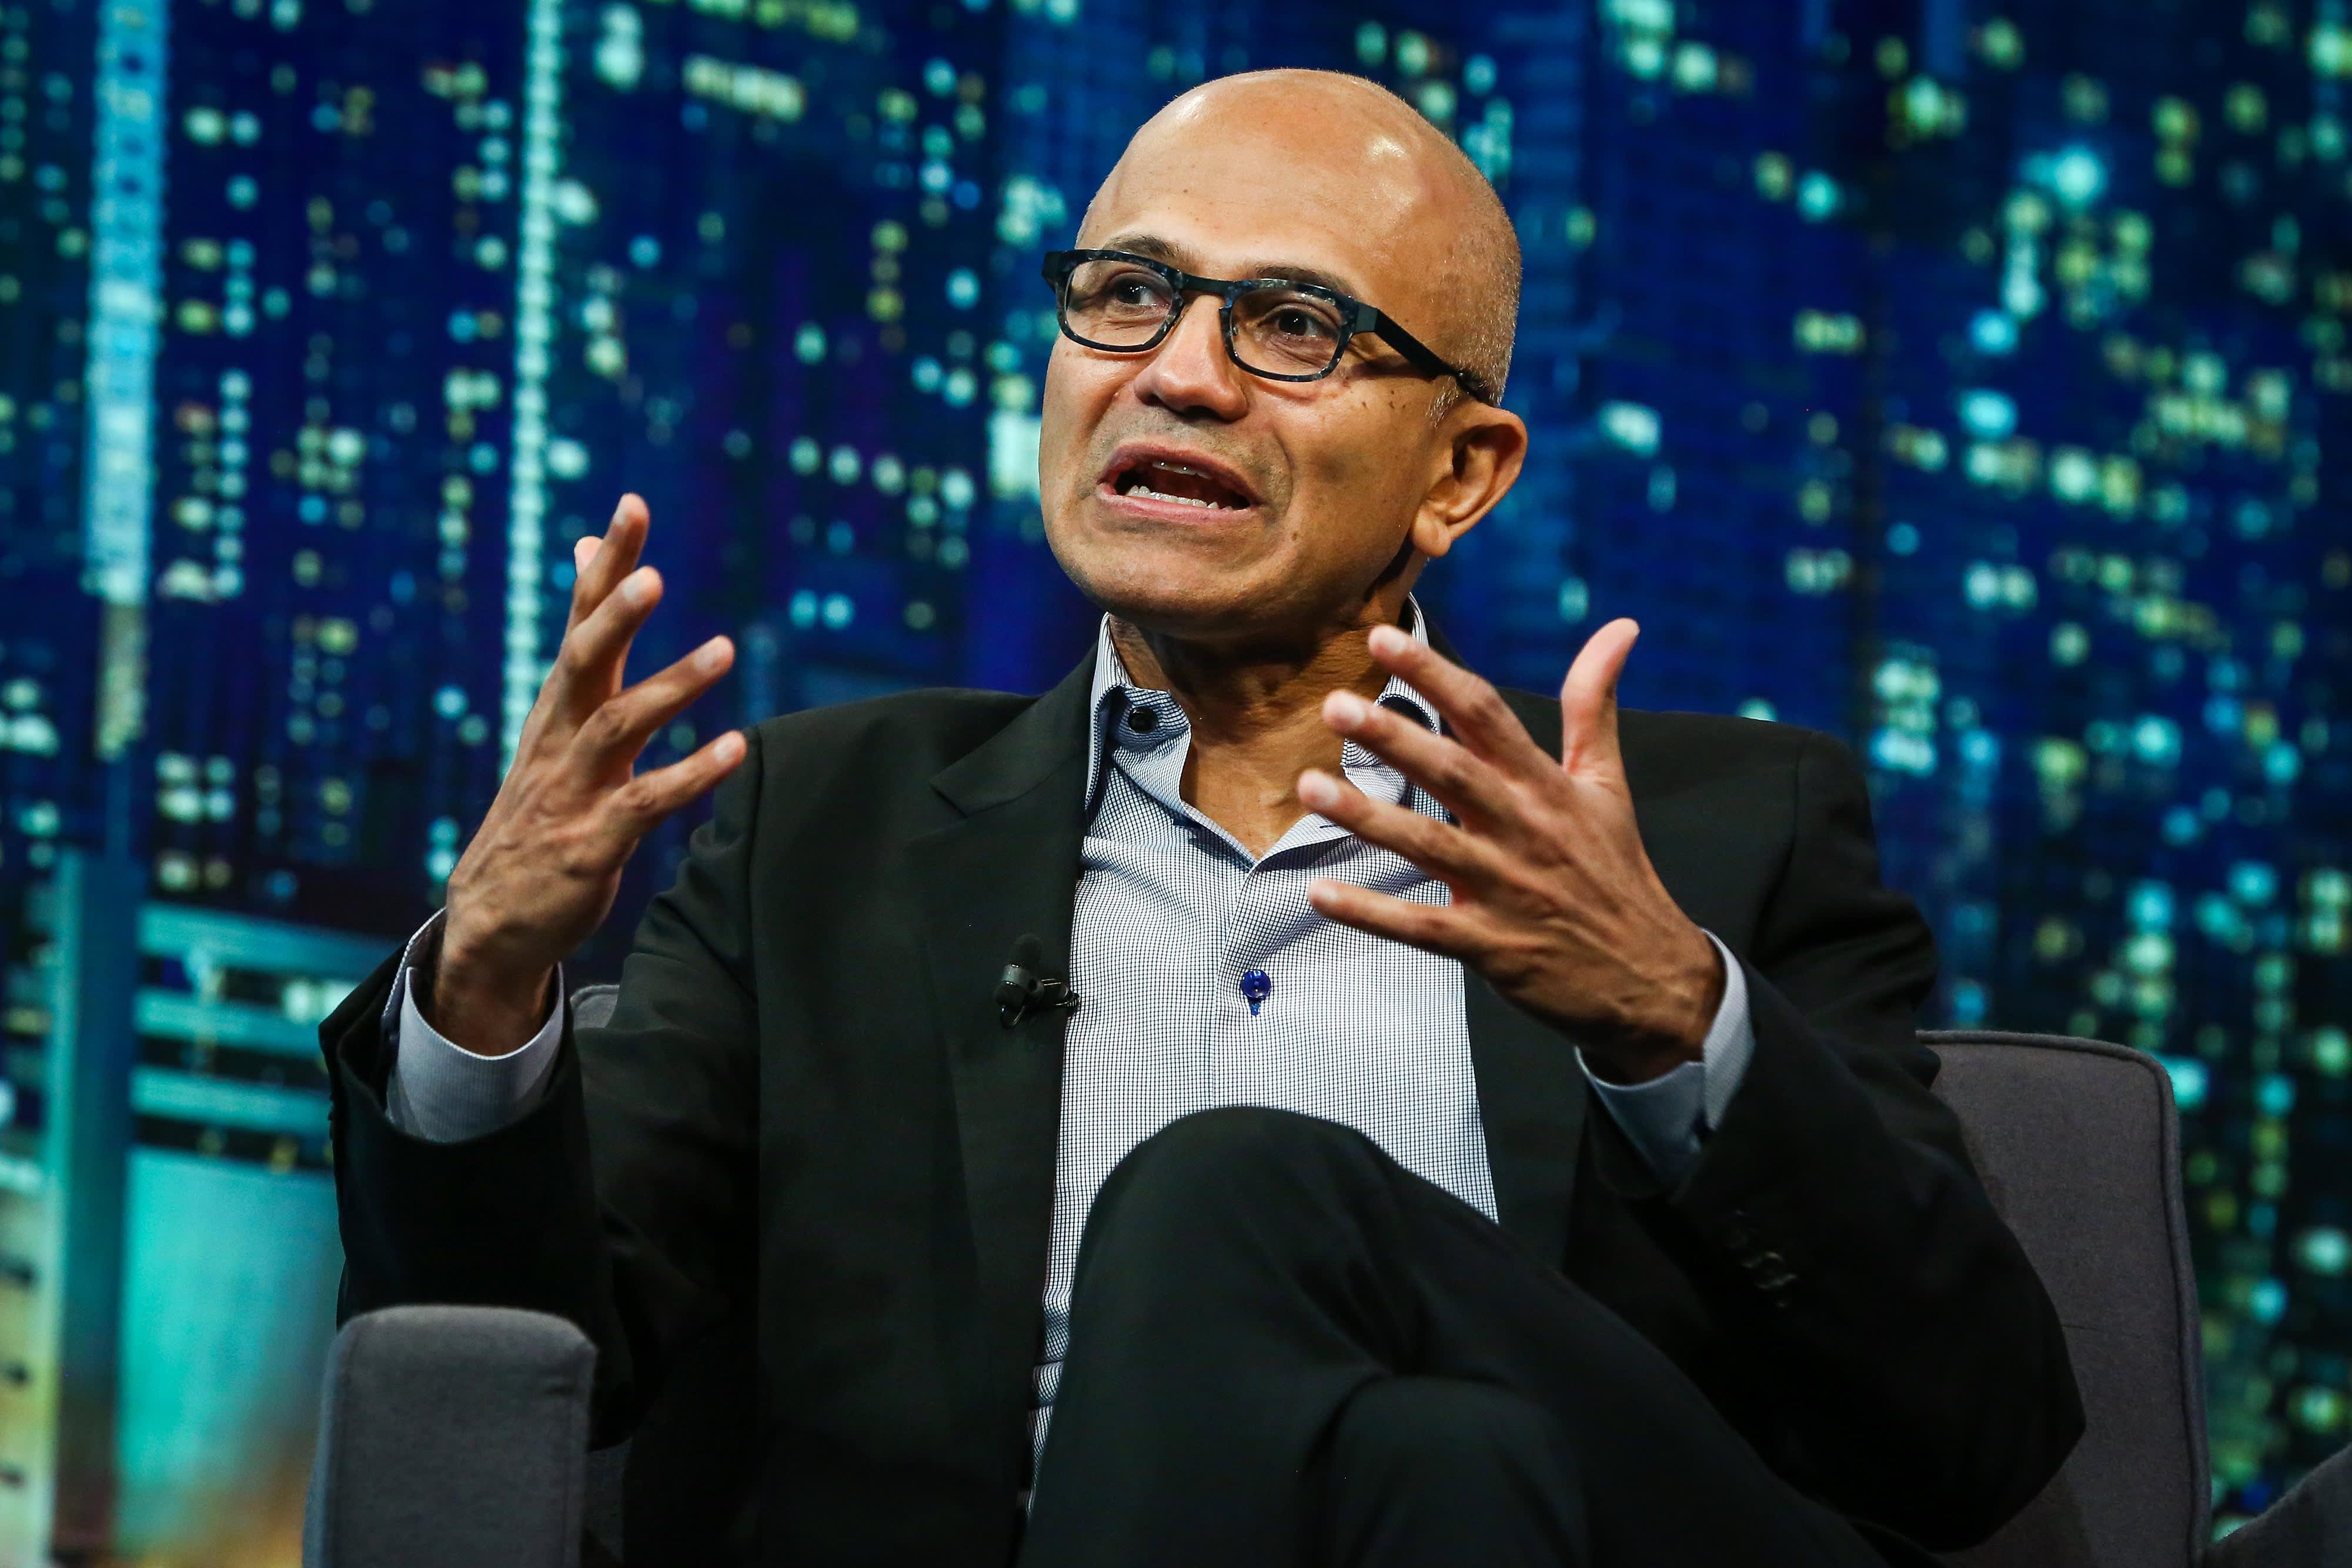 Microsoft Azure has an edge over Amazon Web Services at big companies, Goldman Sachs survey says